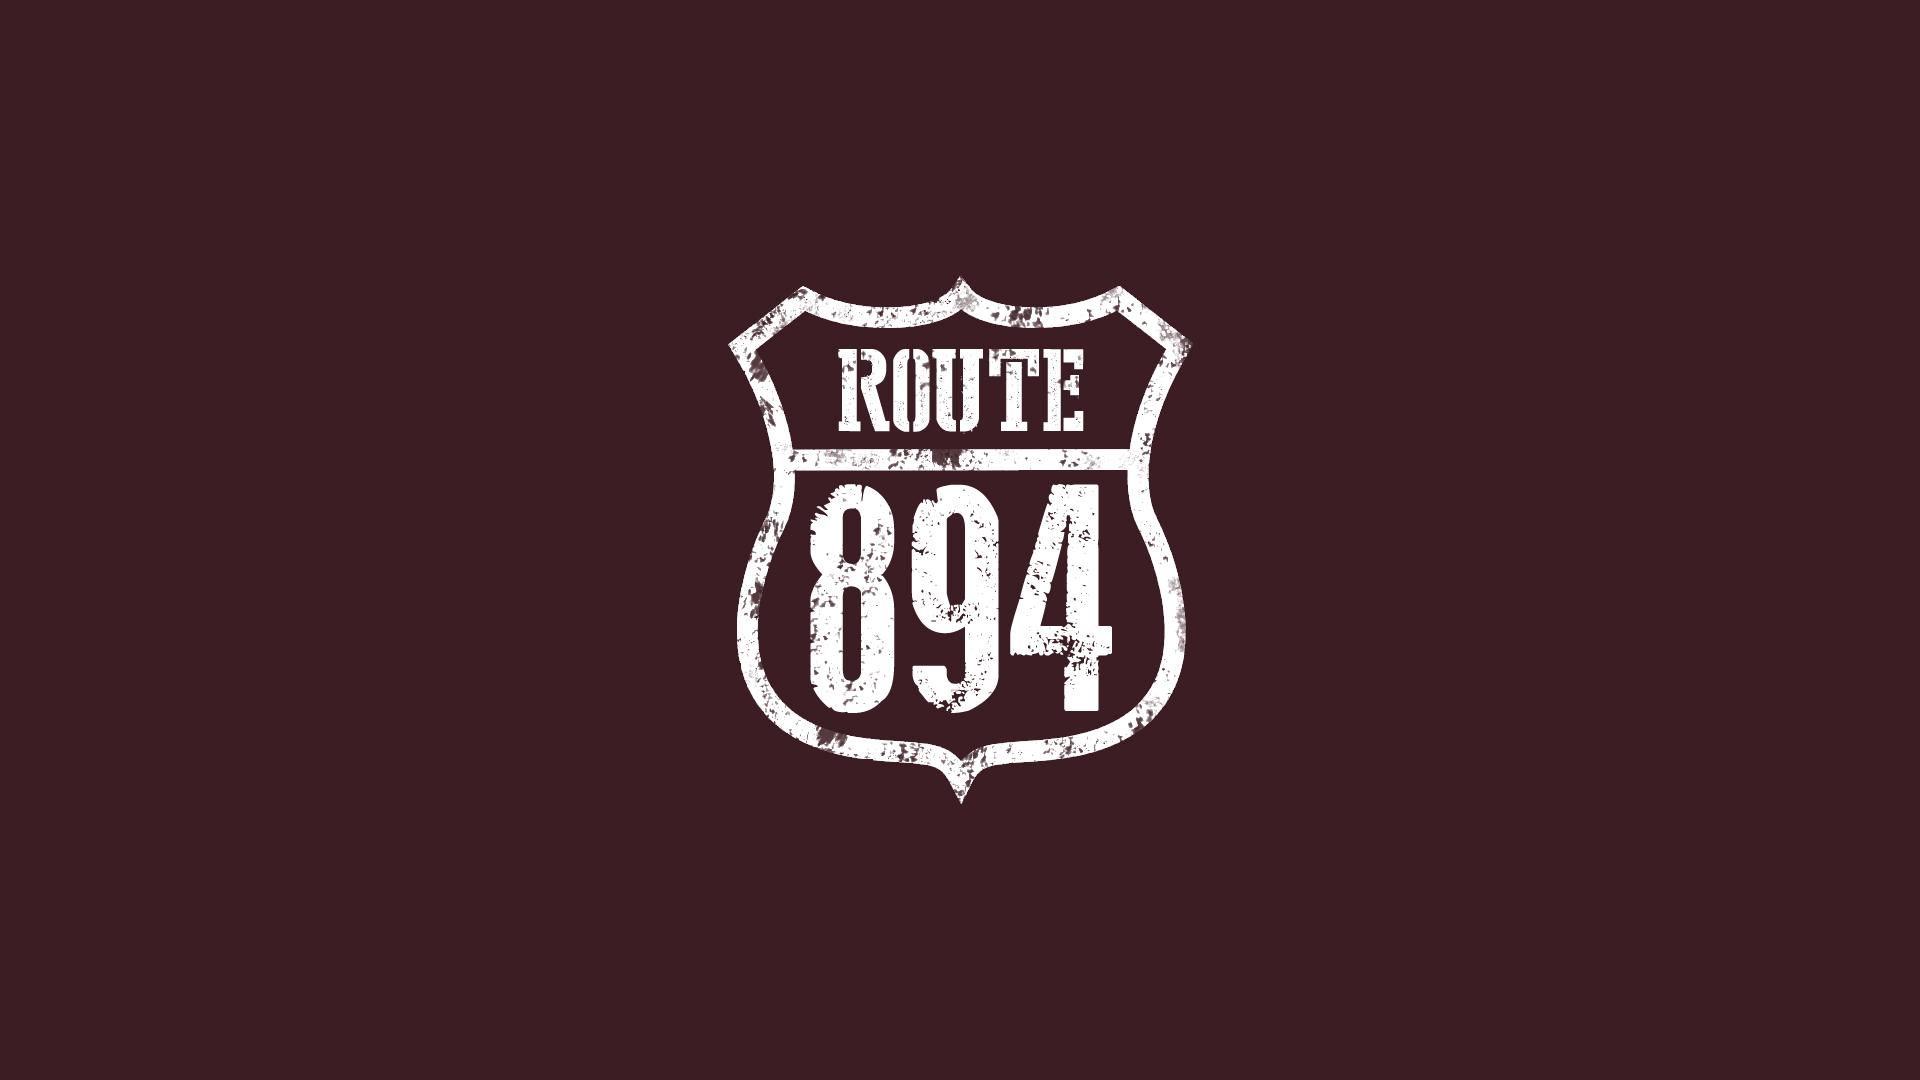 FiveM] Route894 Information[English] | GEEK894 com